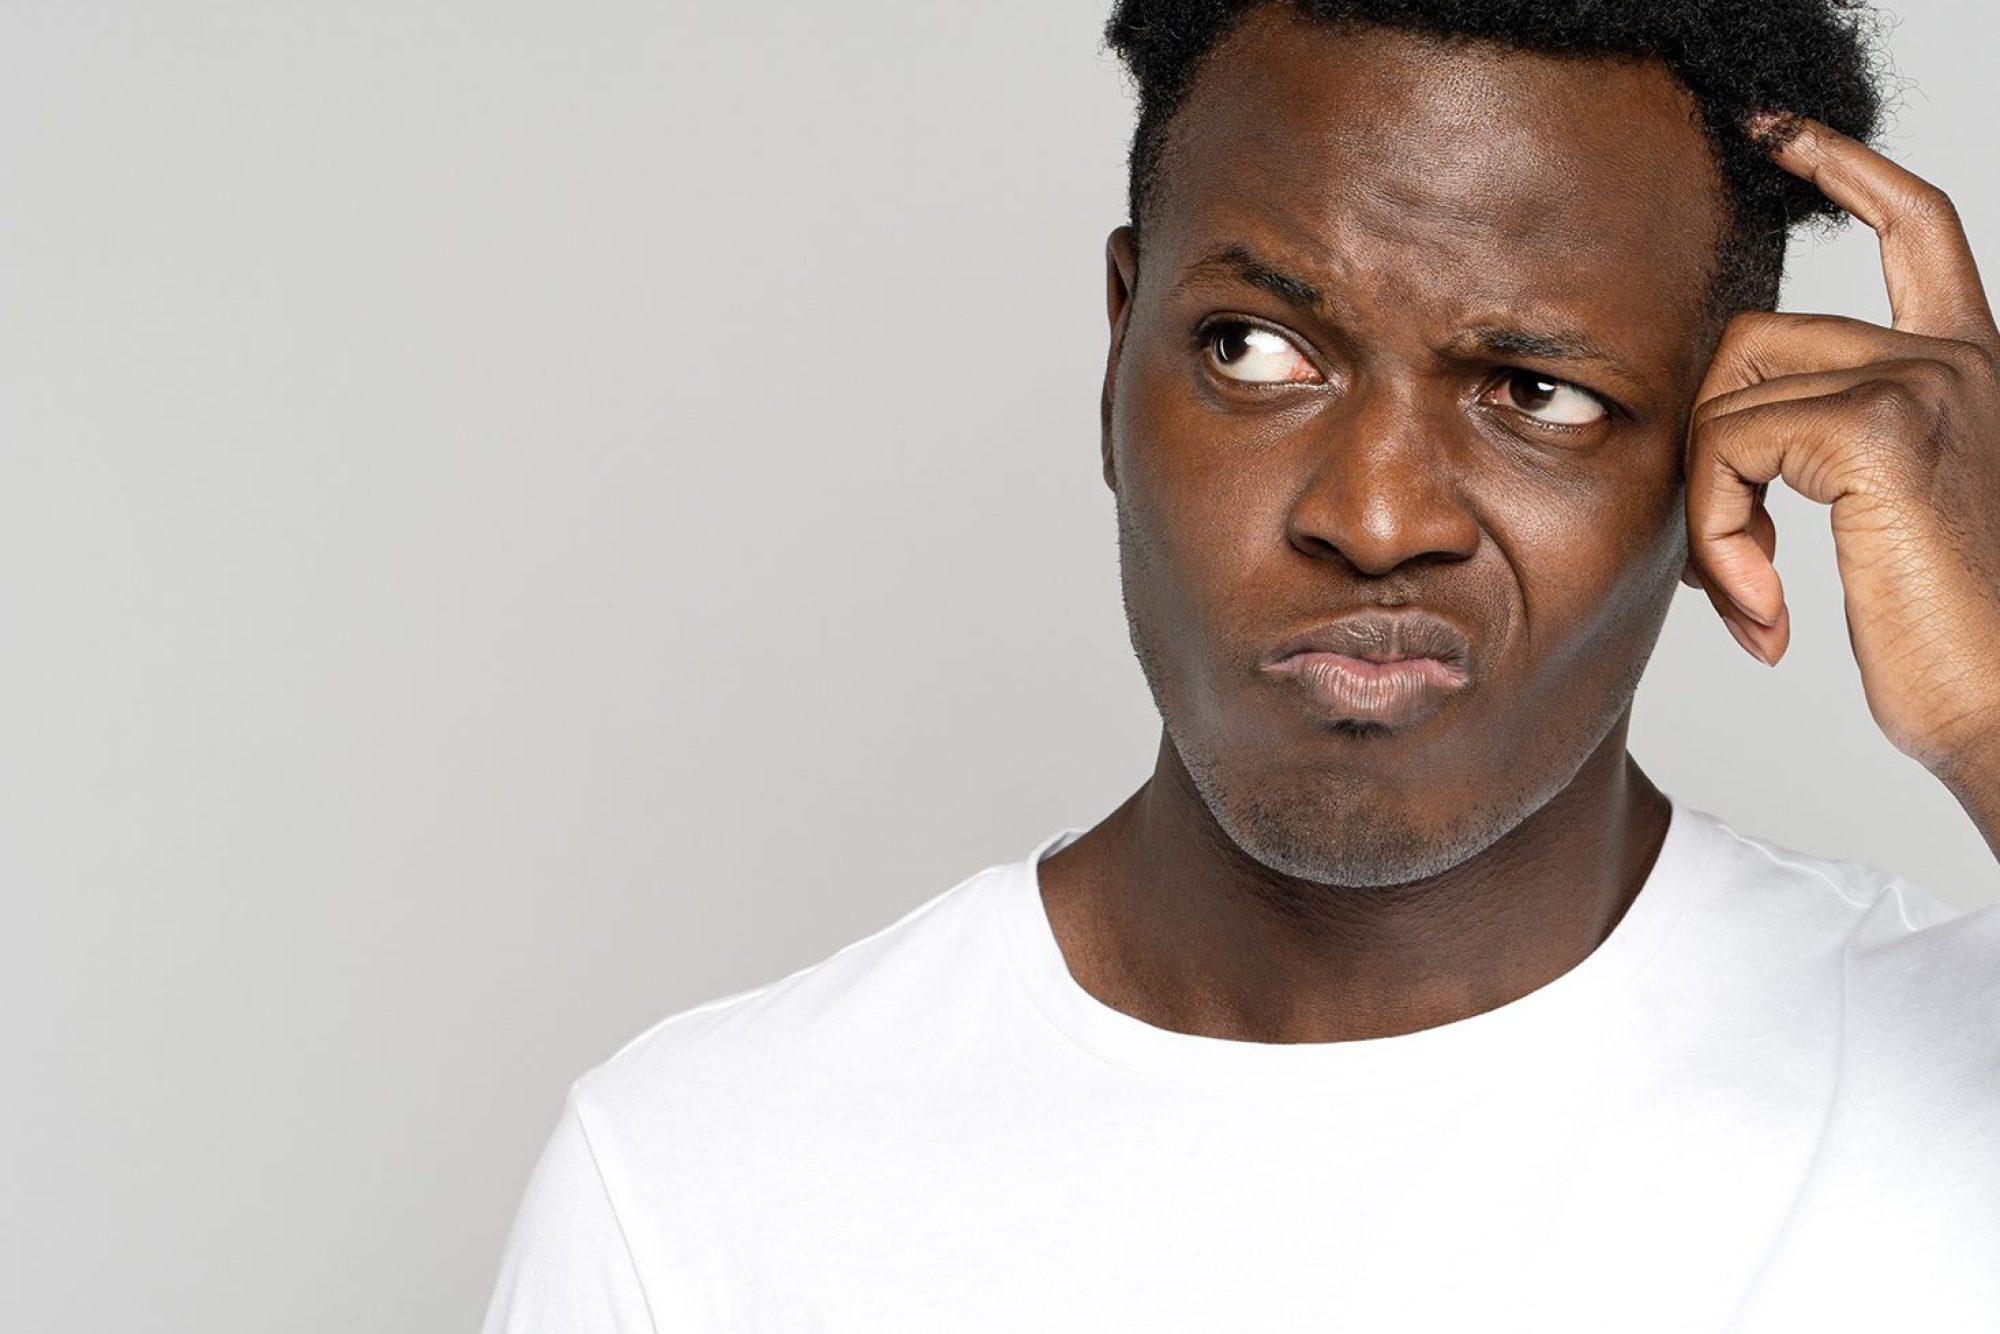 unsure-doubtful-african-man-scratching-head-lookin-smaller